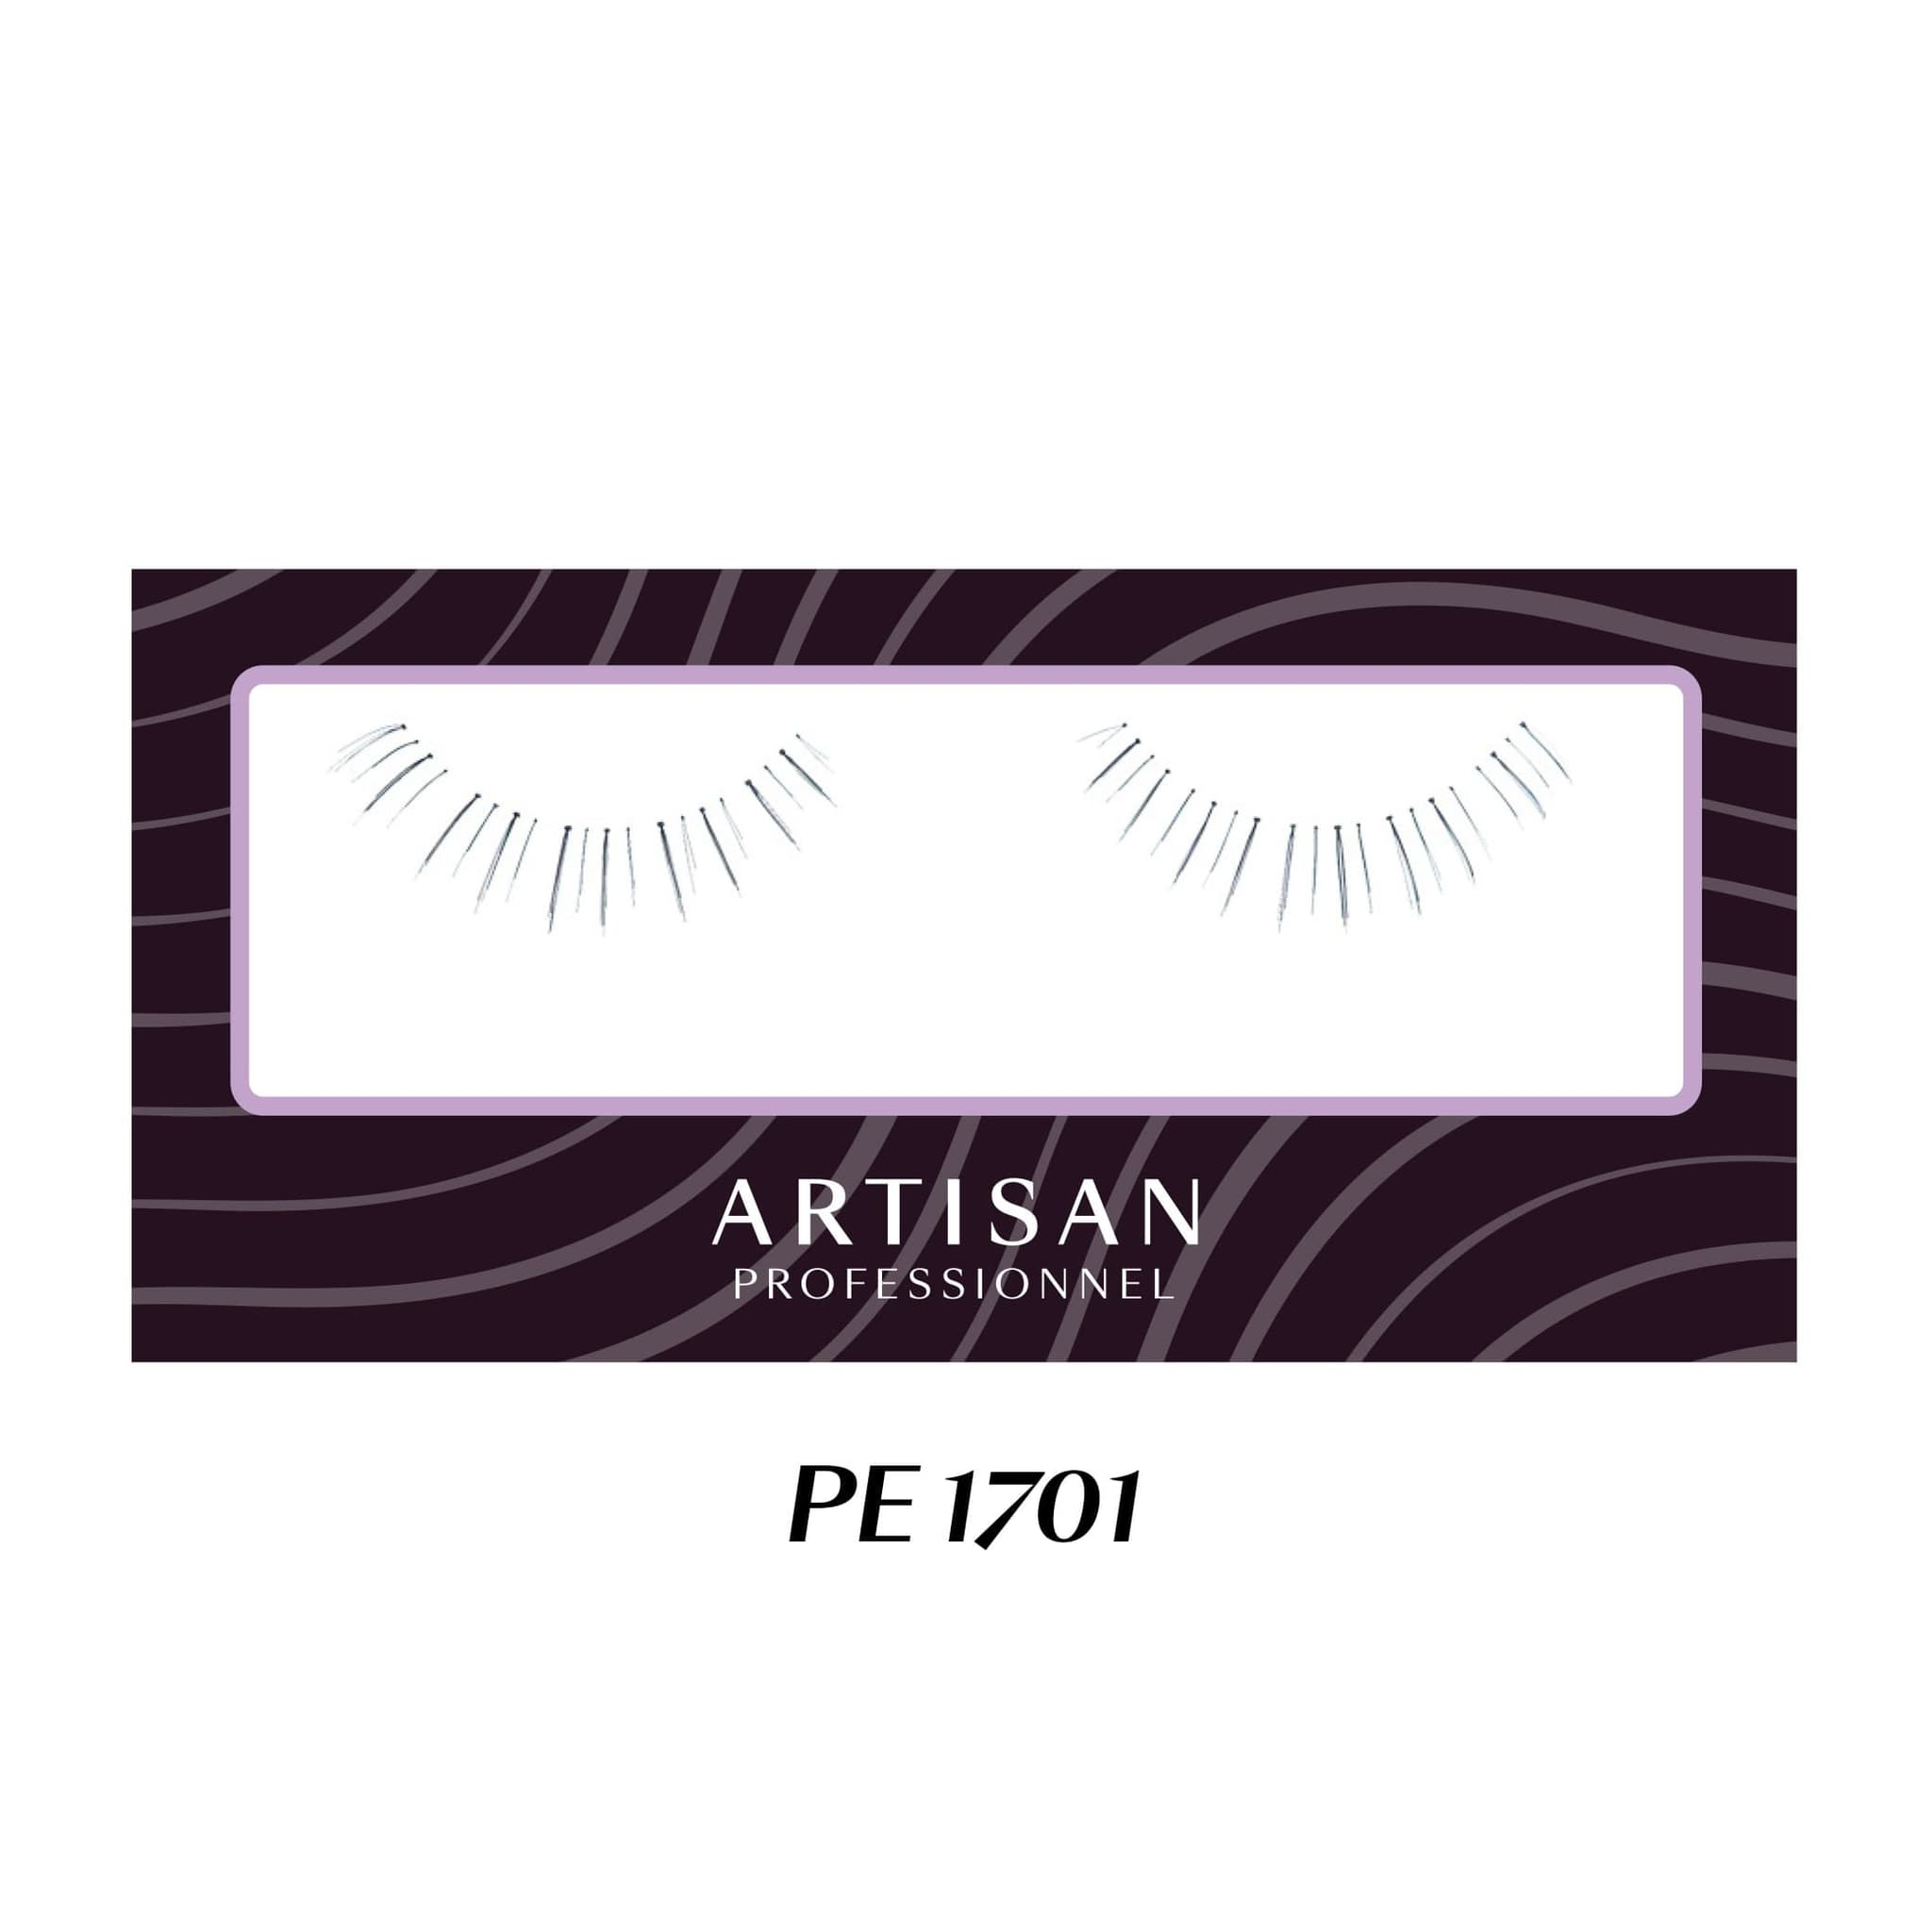 ARTISAN - Petite 1701 x Felicia Sasongko - Bulu mata palsu bawah thumbnail